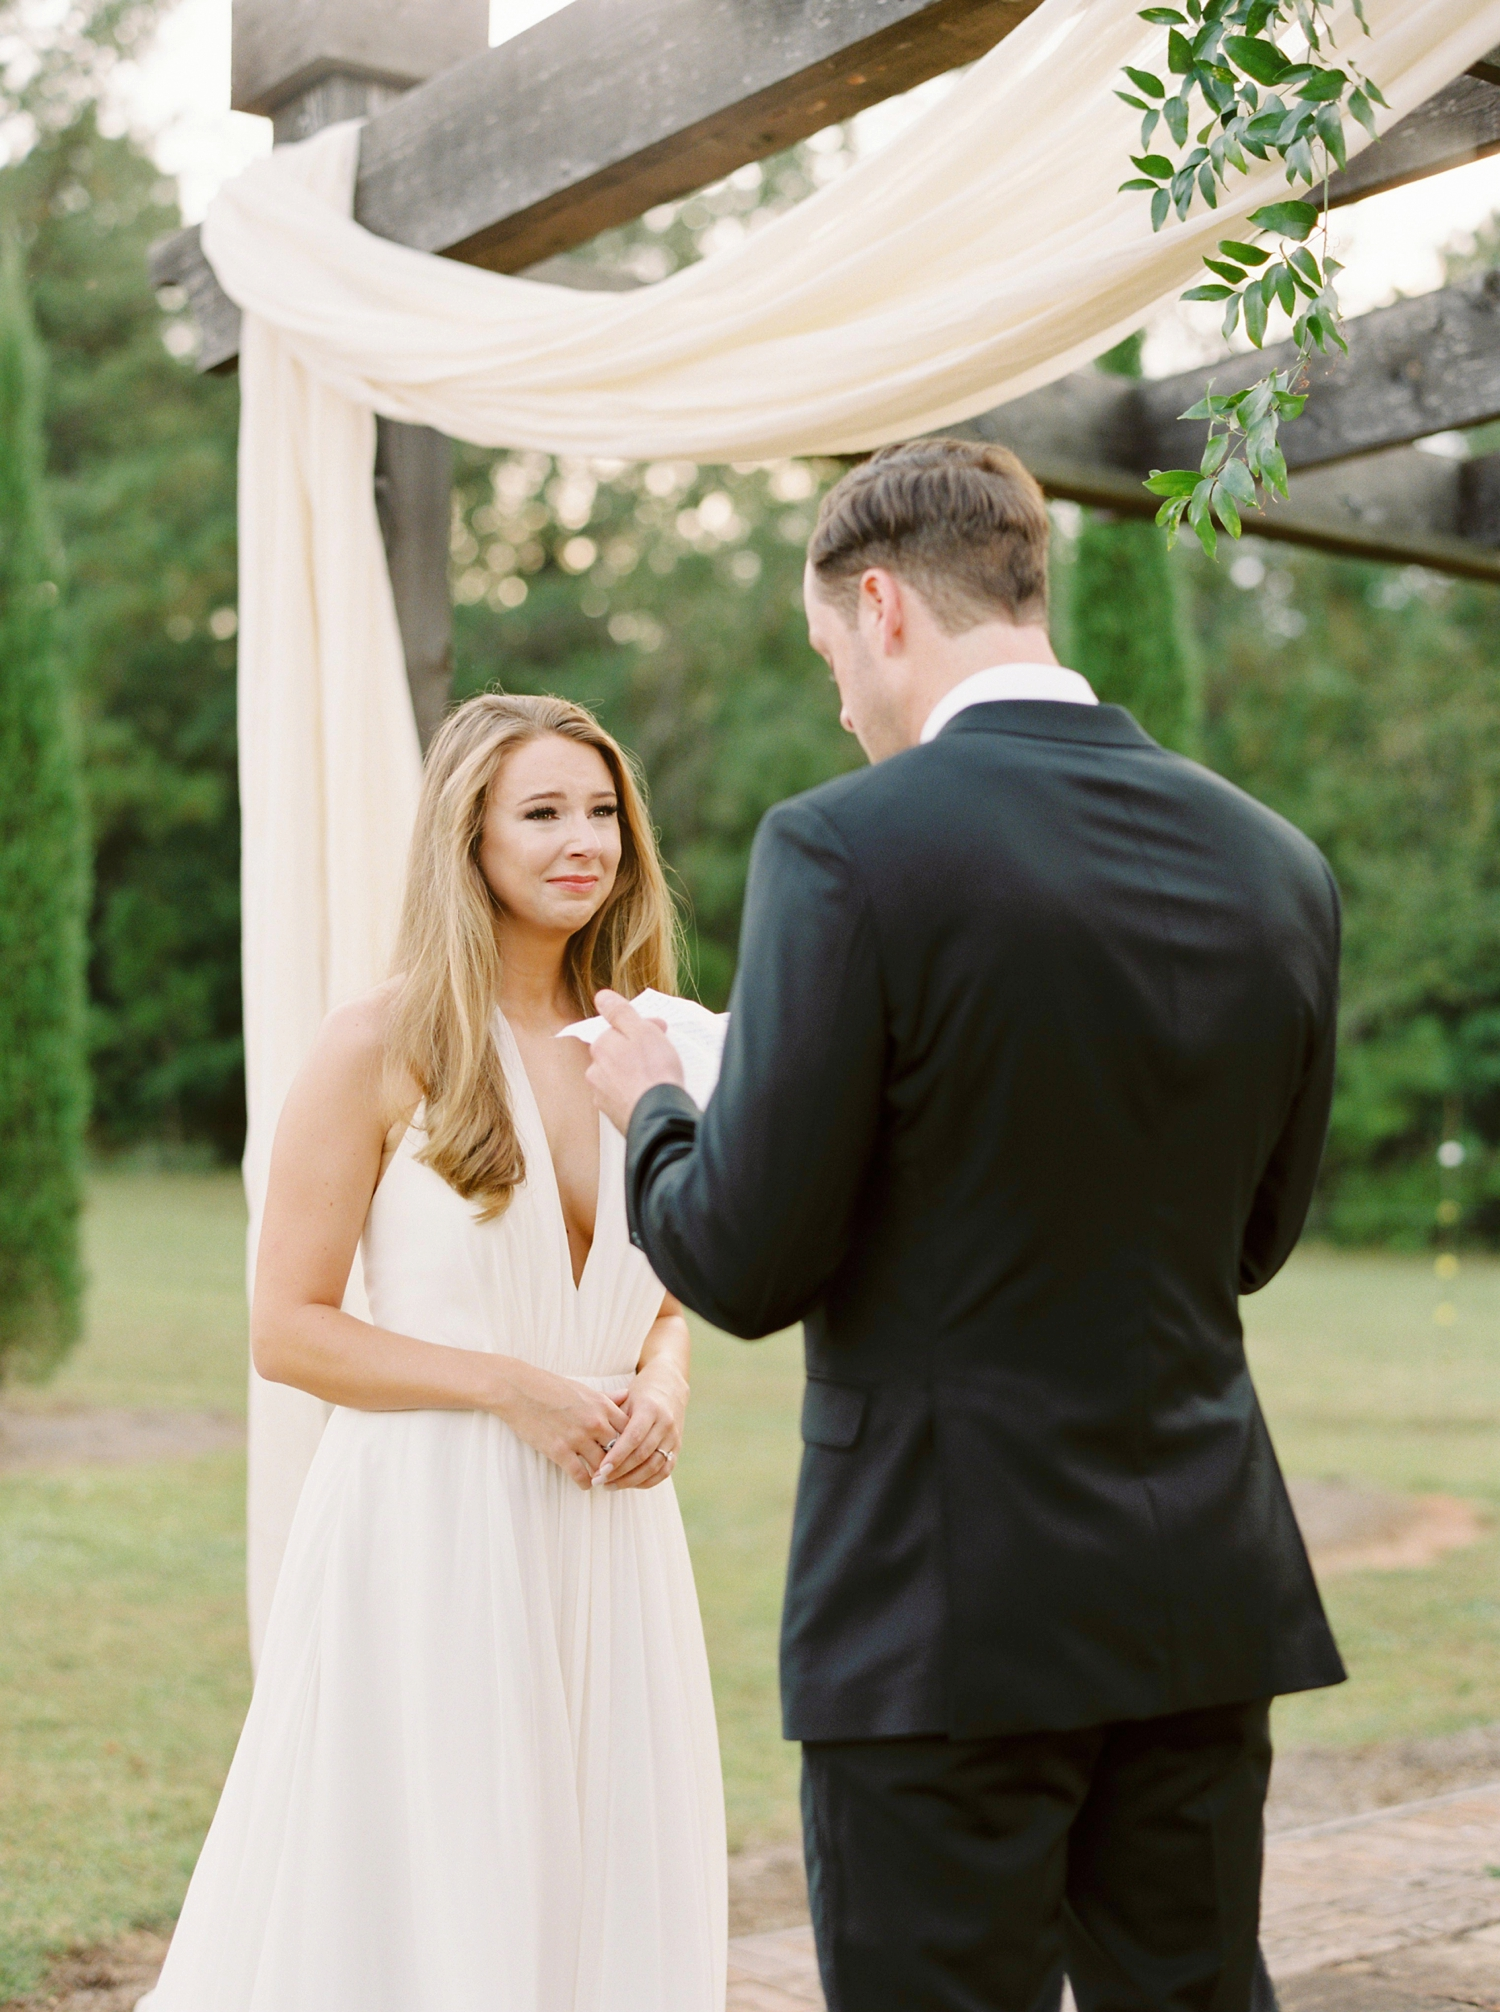 Calgary wedding photographers | georgia wedding photographers | fine art film | Justine Milton Photography | georgia wedding | wedding ceremony | wedding vows